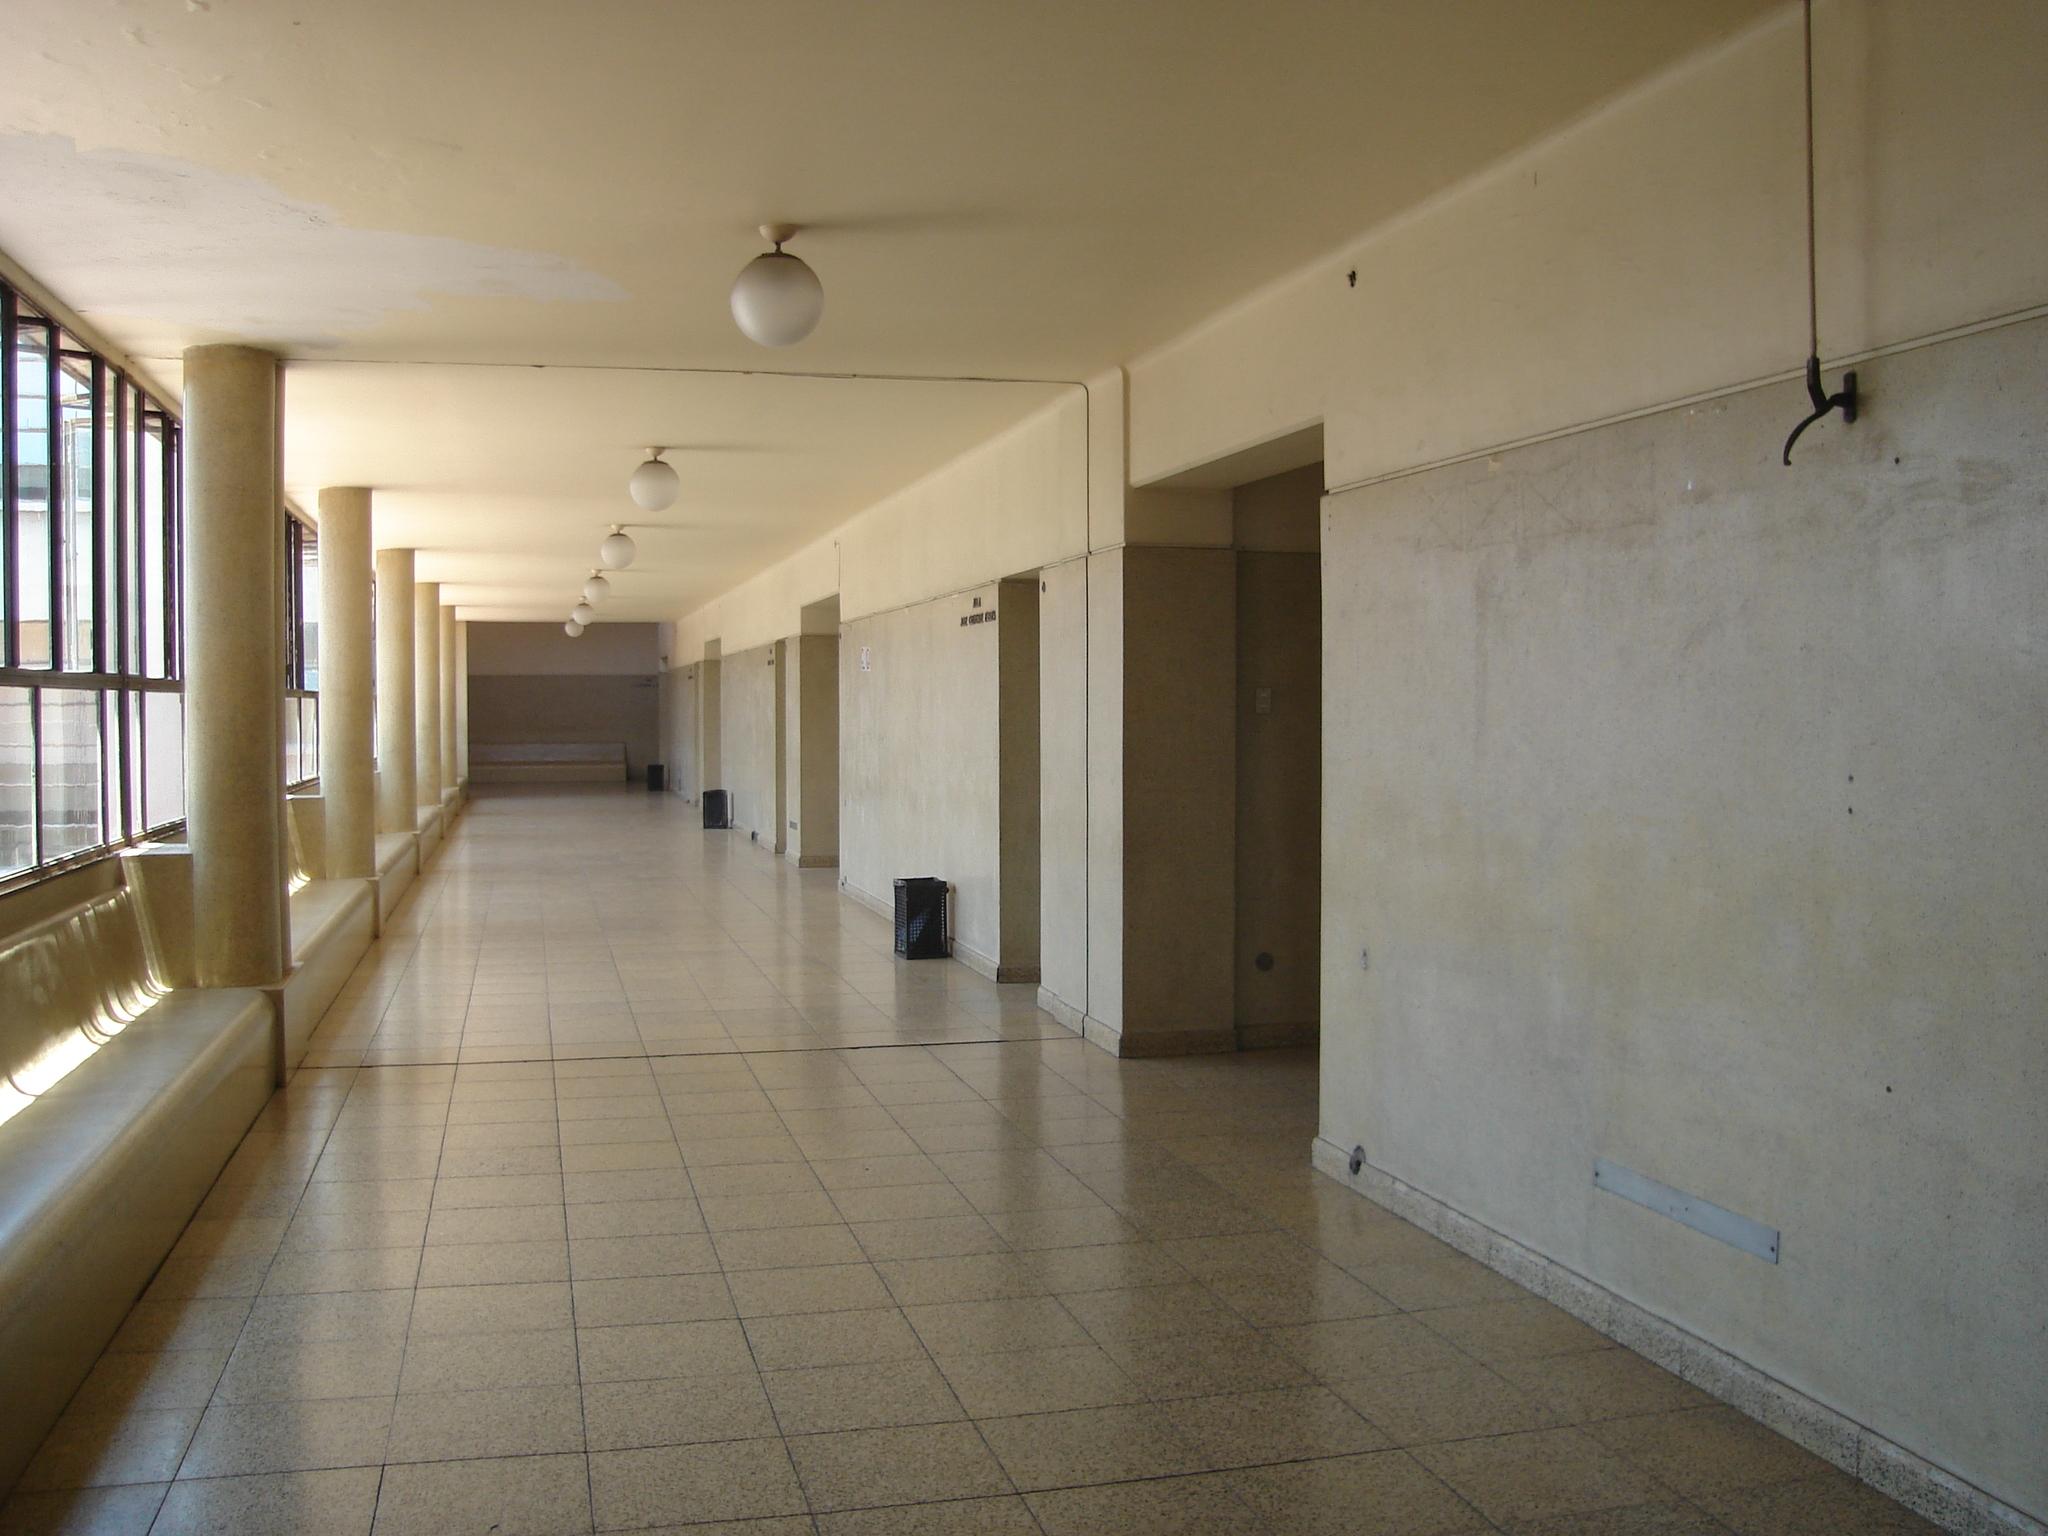 File pasillo derecho uch jpg wikimedia commons - Como pintar el pasillo ...